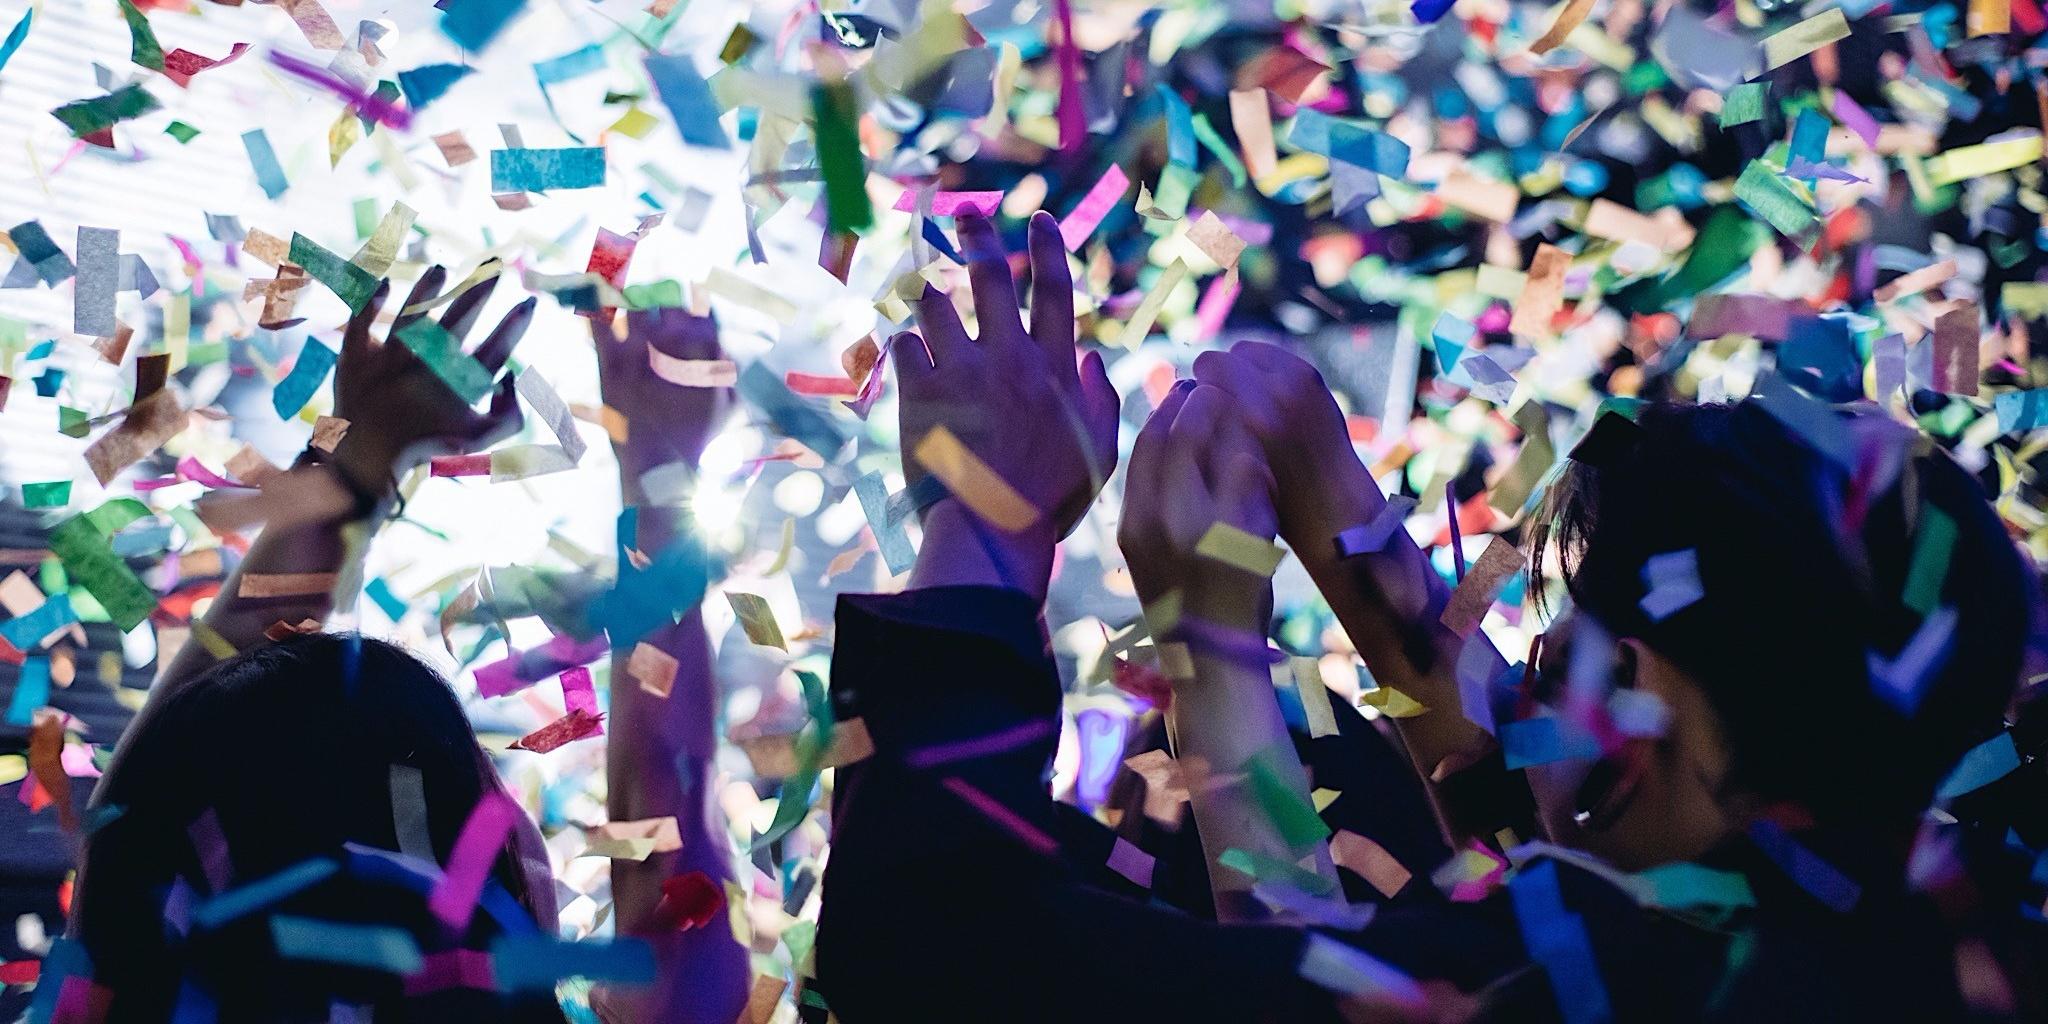 PHOTO GALLERY: Zouk's epic, bittersweet final parties at Jiak Kim Street